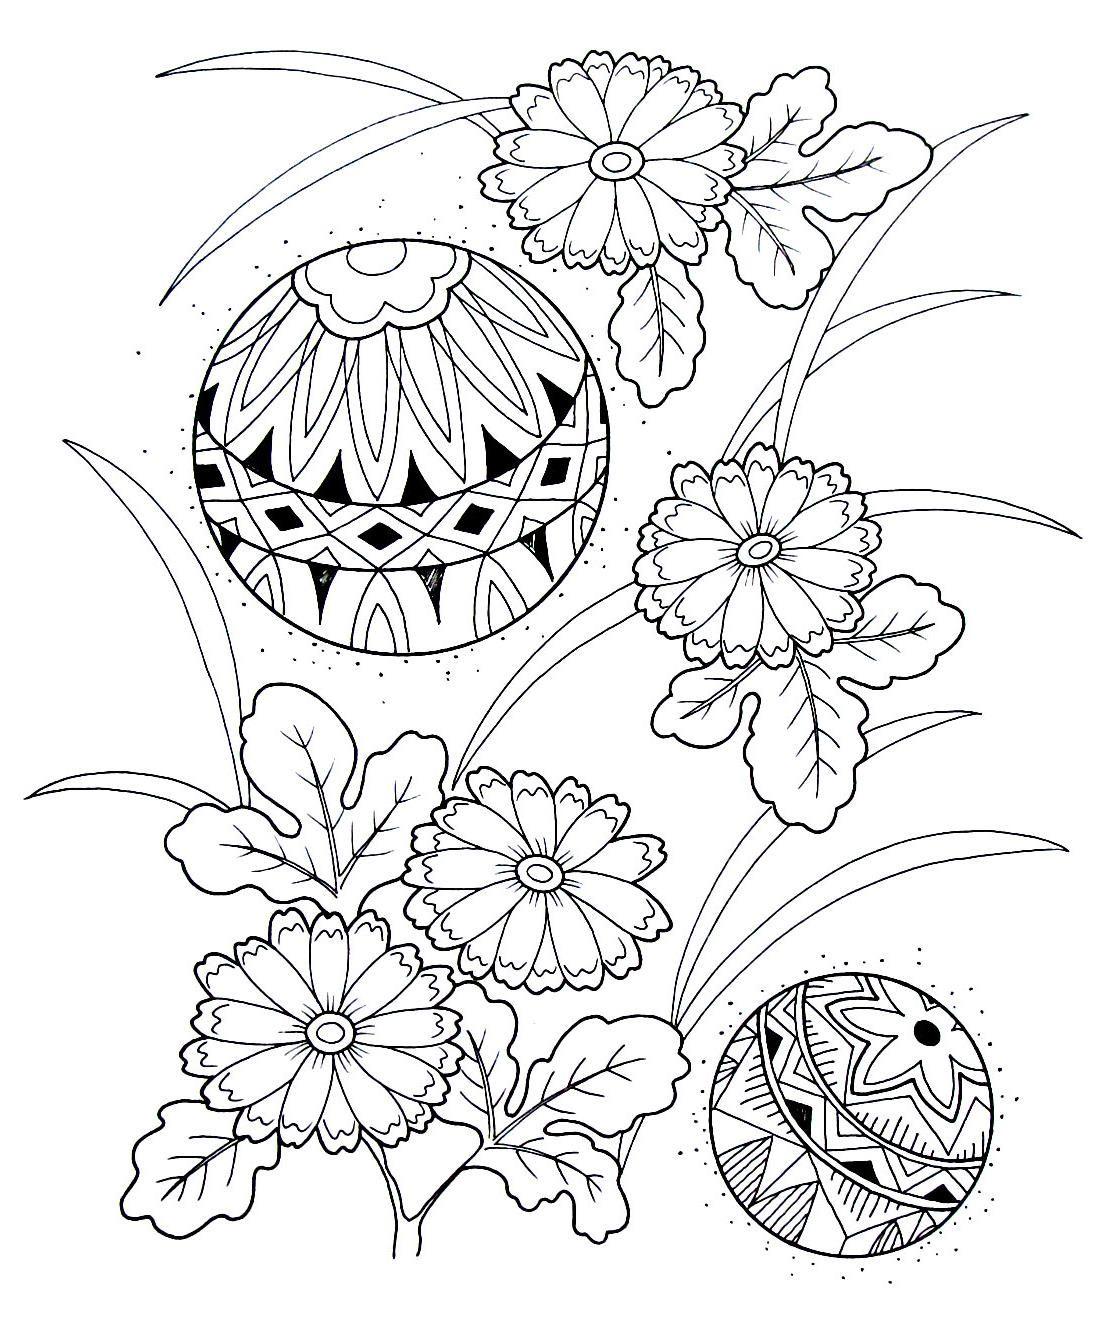 Balls and chrysanthemums - Japanese design coloring book printable ...